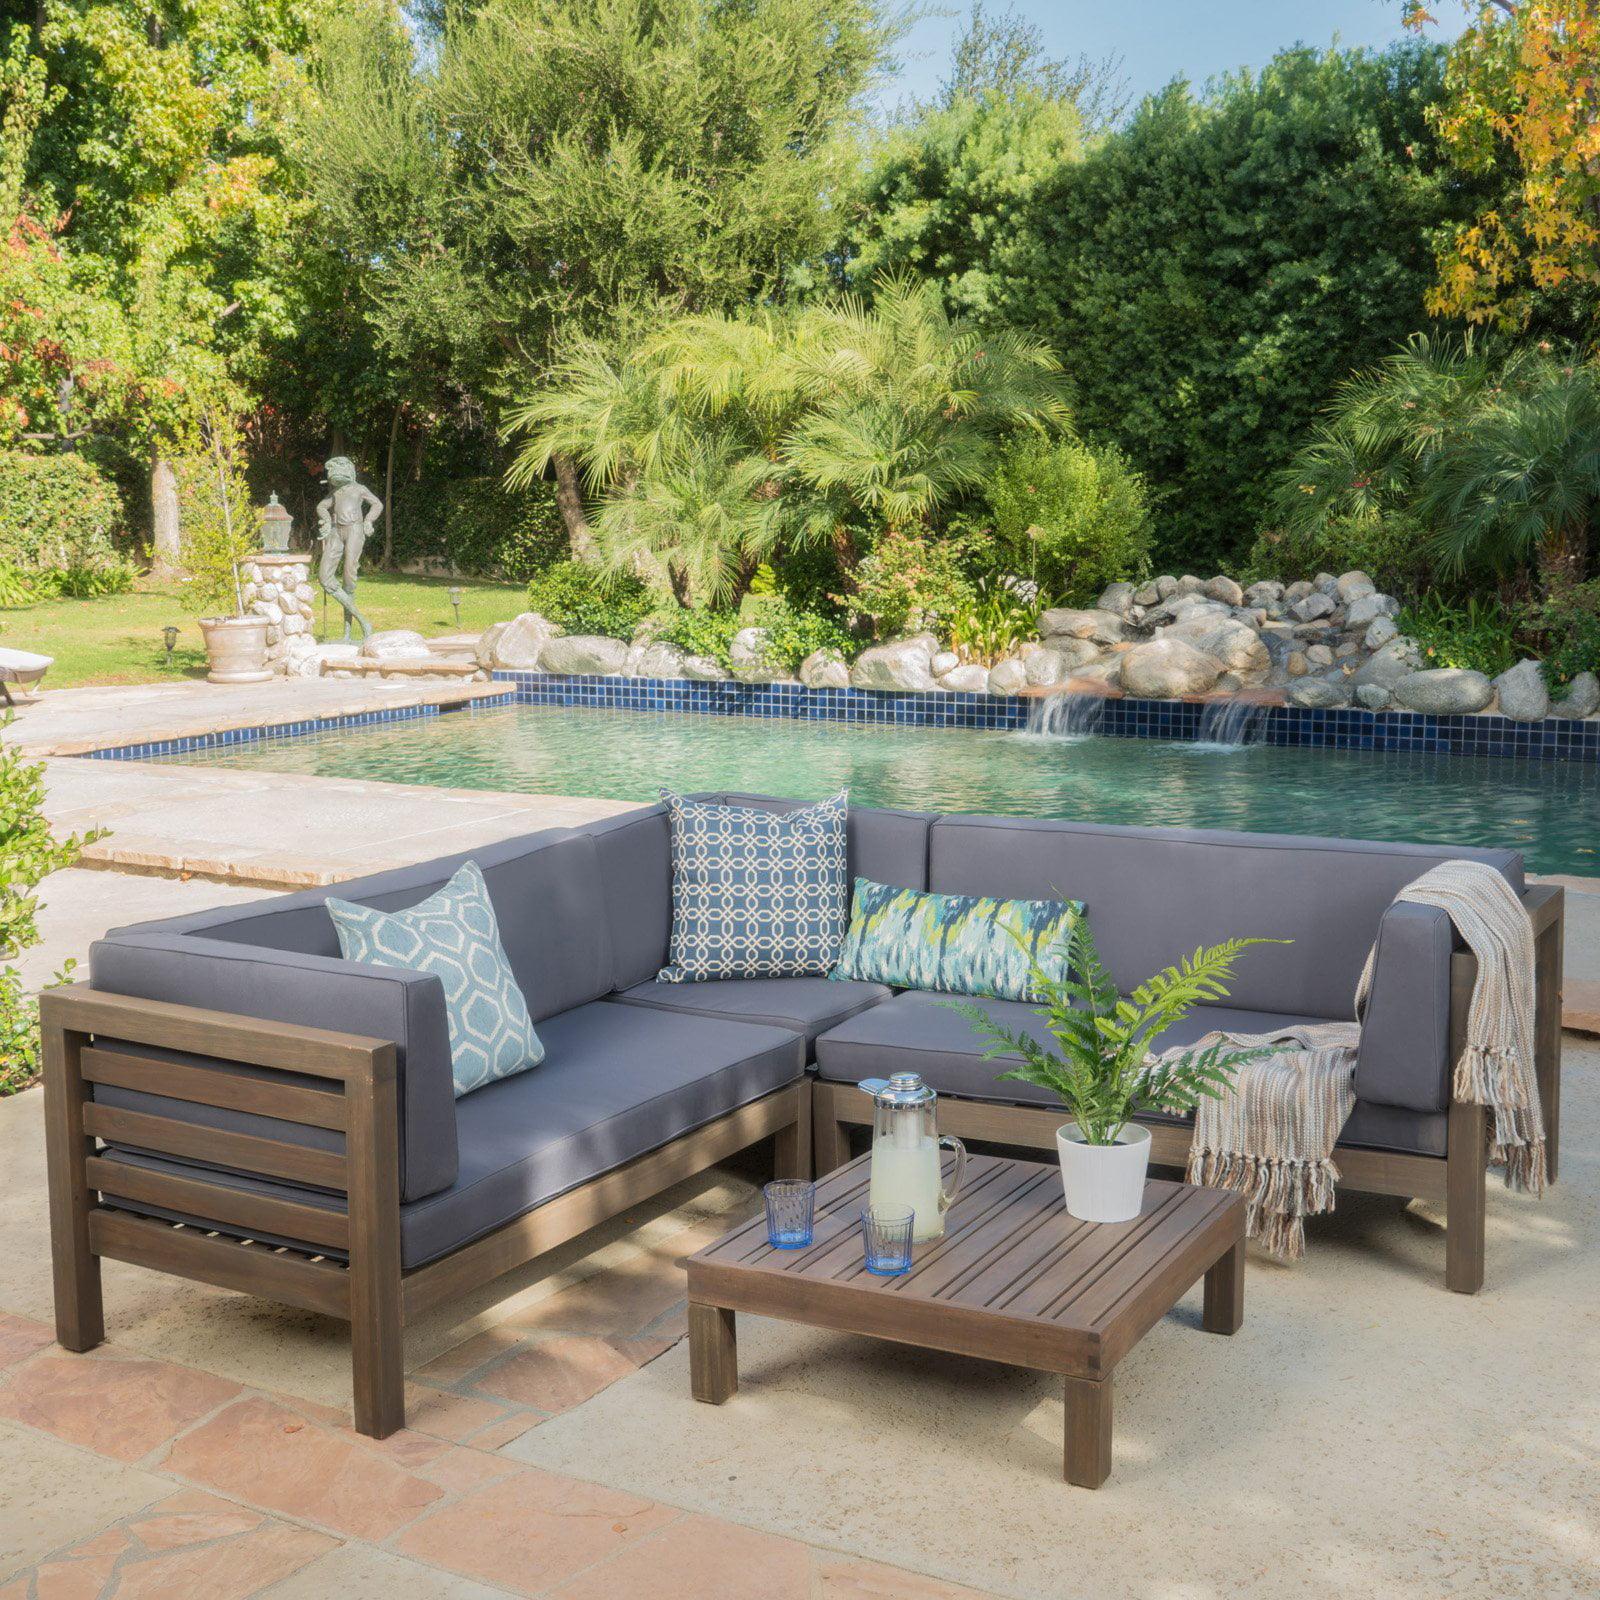 Oana 4pc Acacia Wood Patio Chat Set w/ Cushions - Dark Gray - Christopher Knight Home